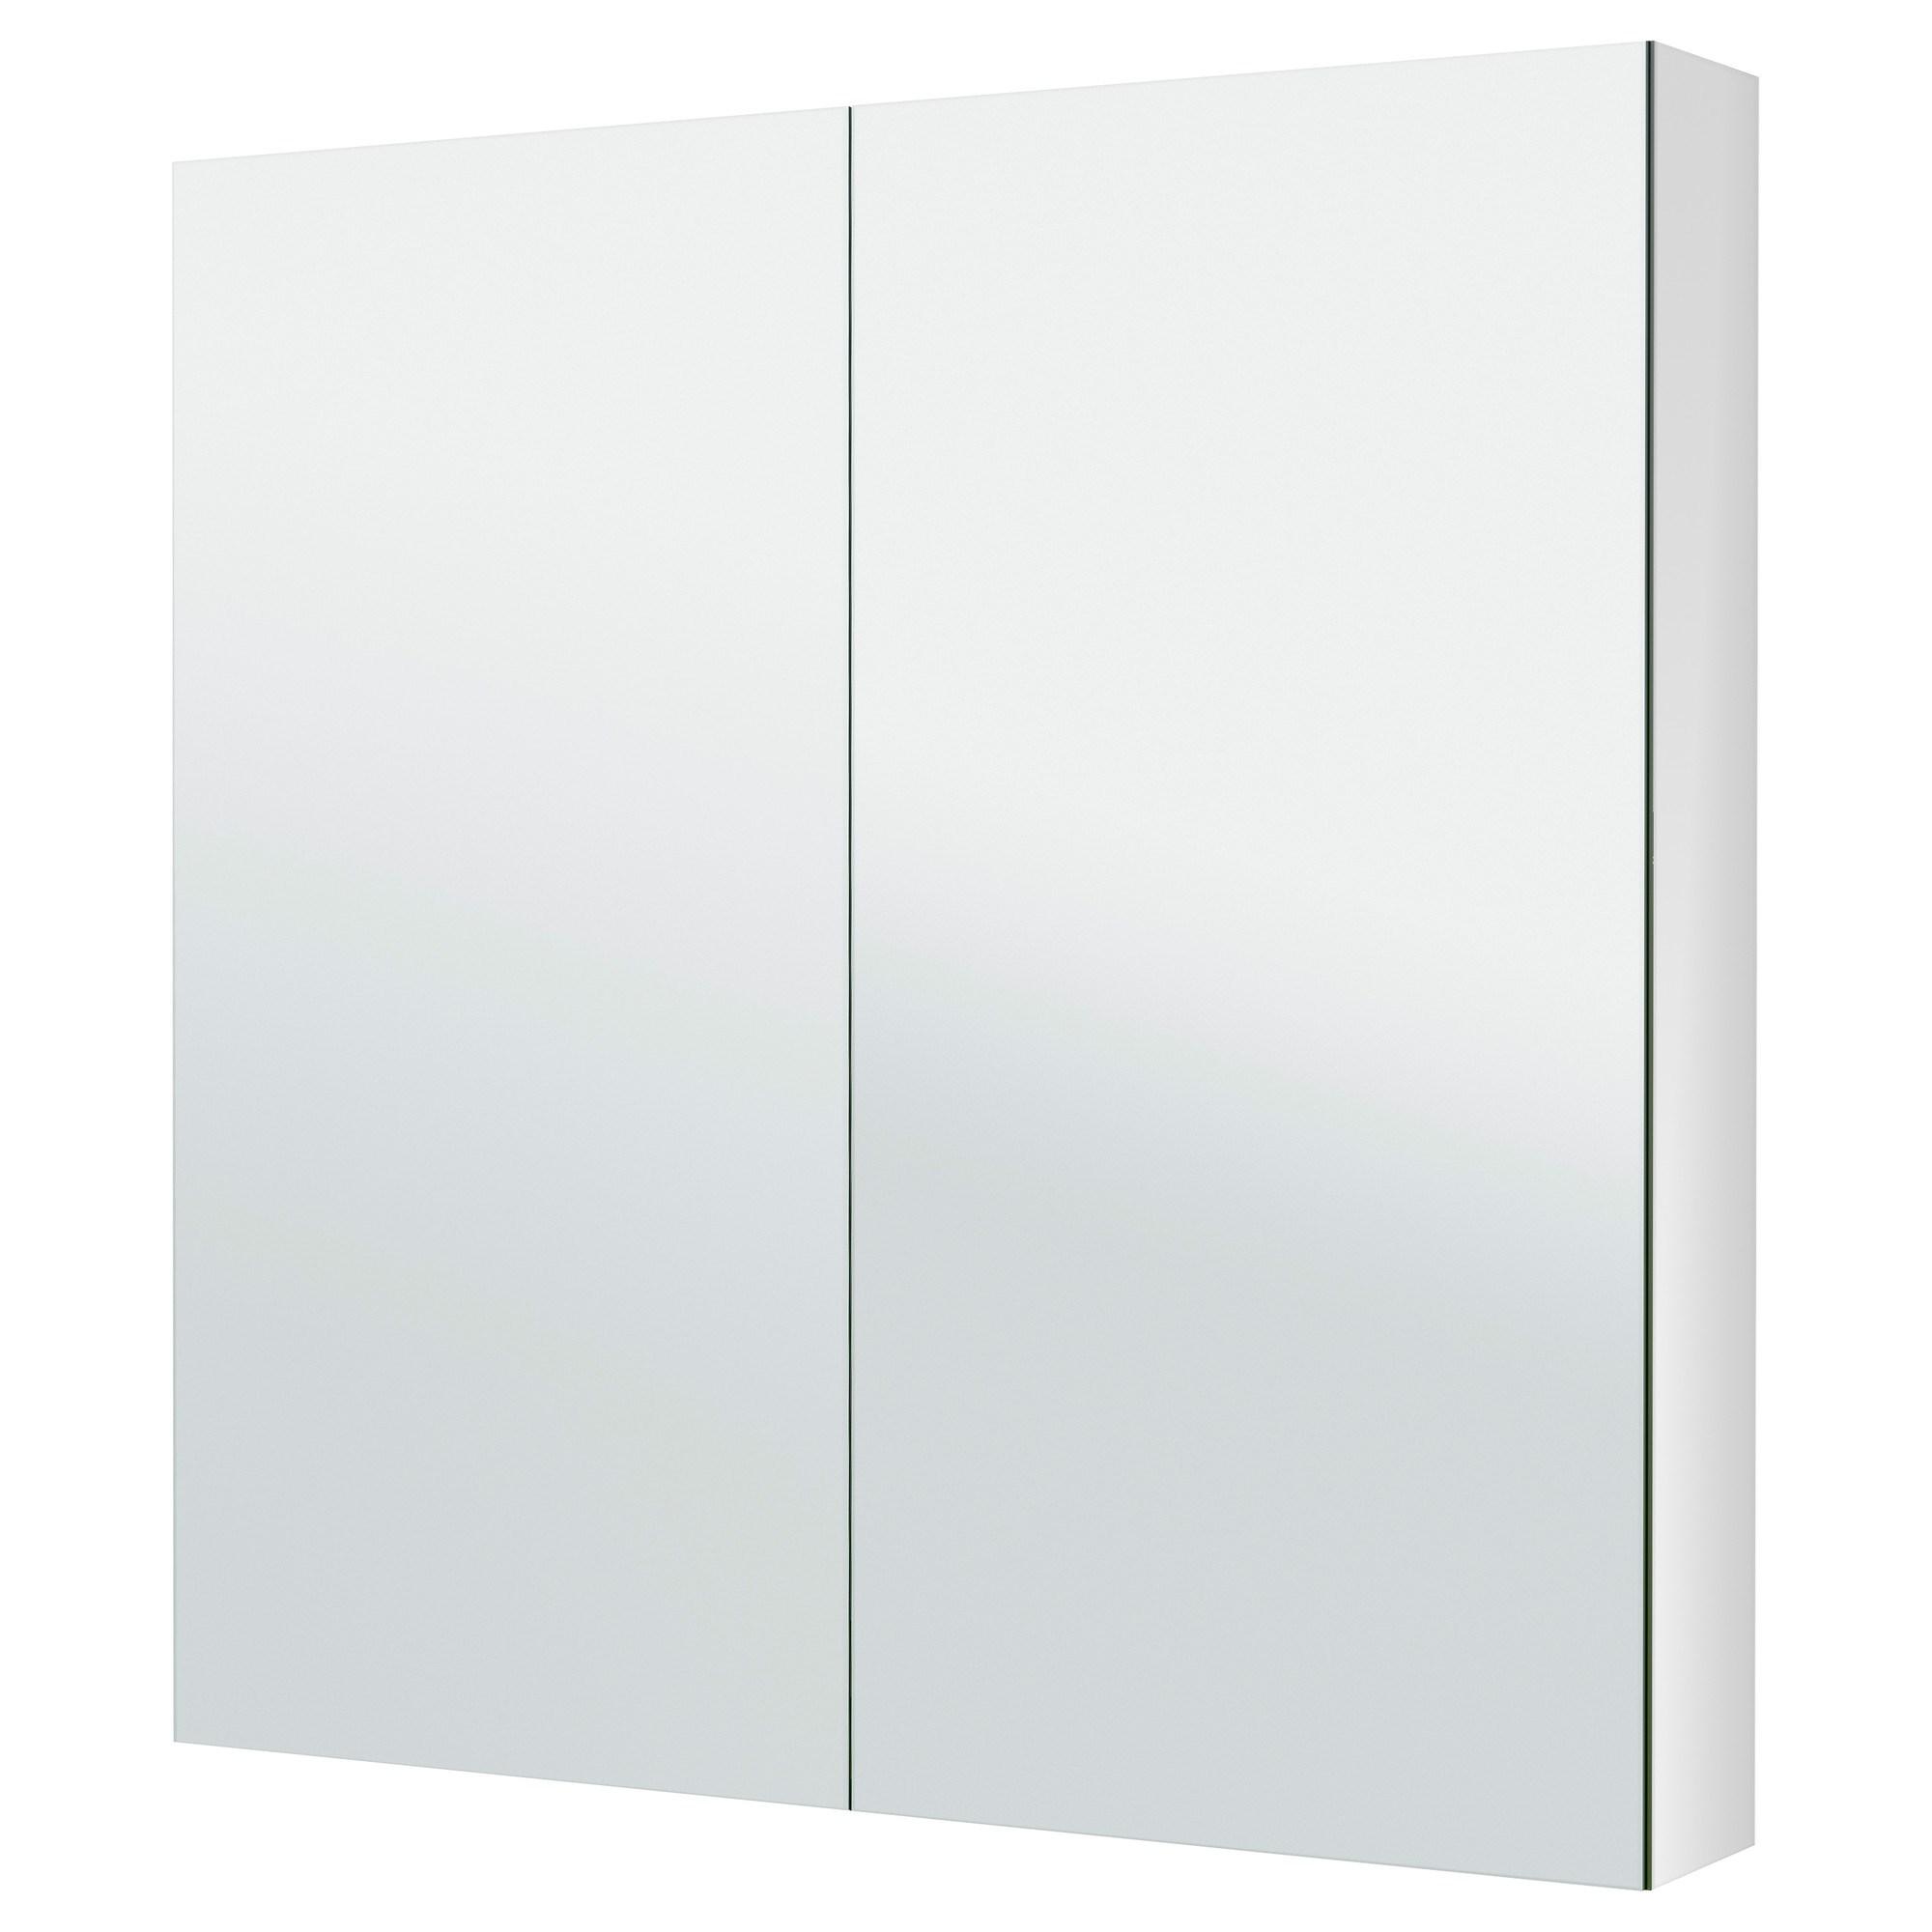 Godmorgon Mirror Cabinet White 100x14x96 Cm Ikea Bathroom